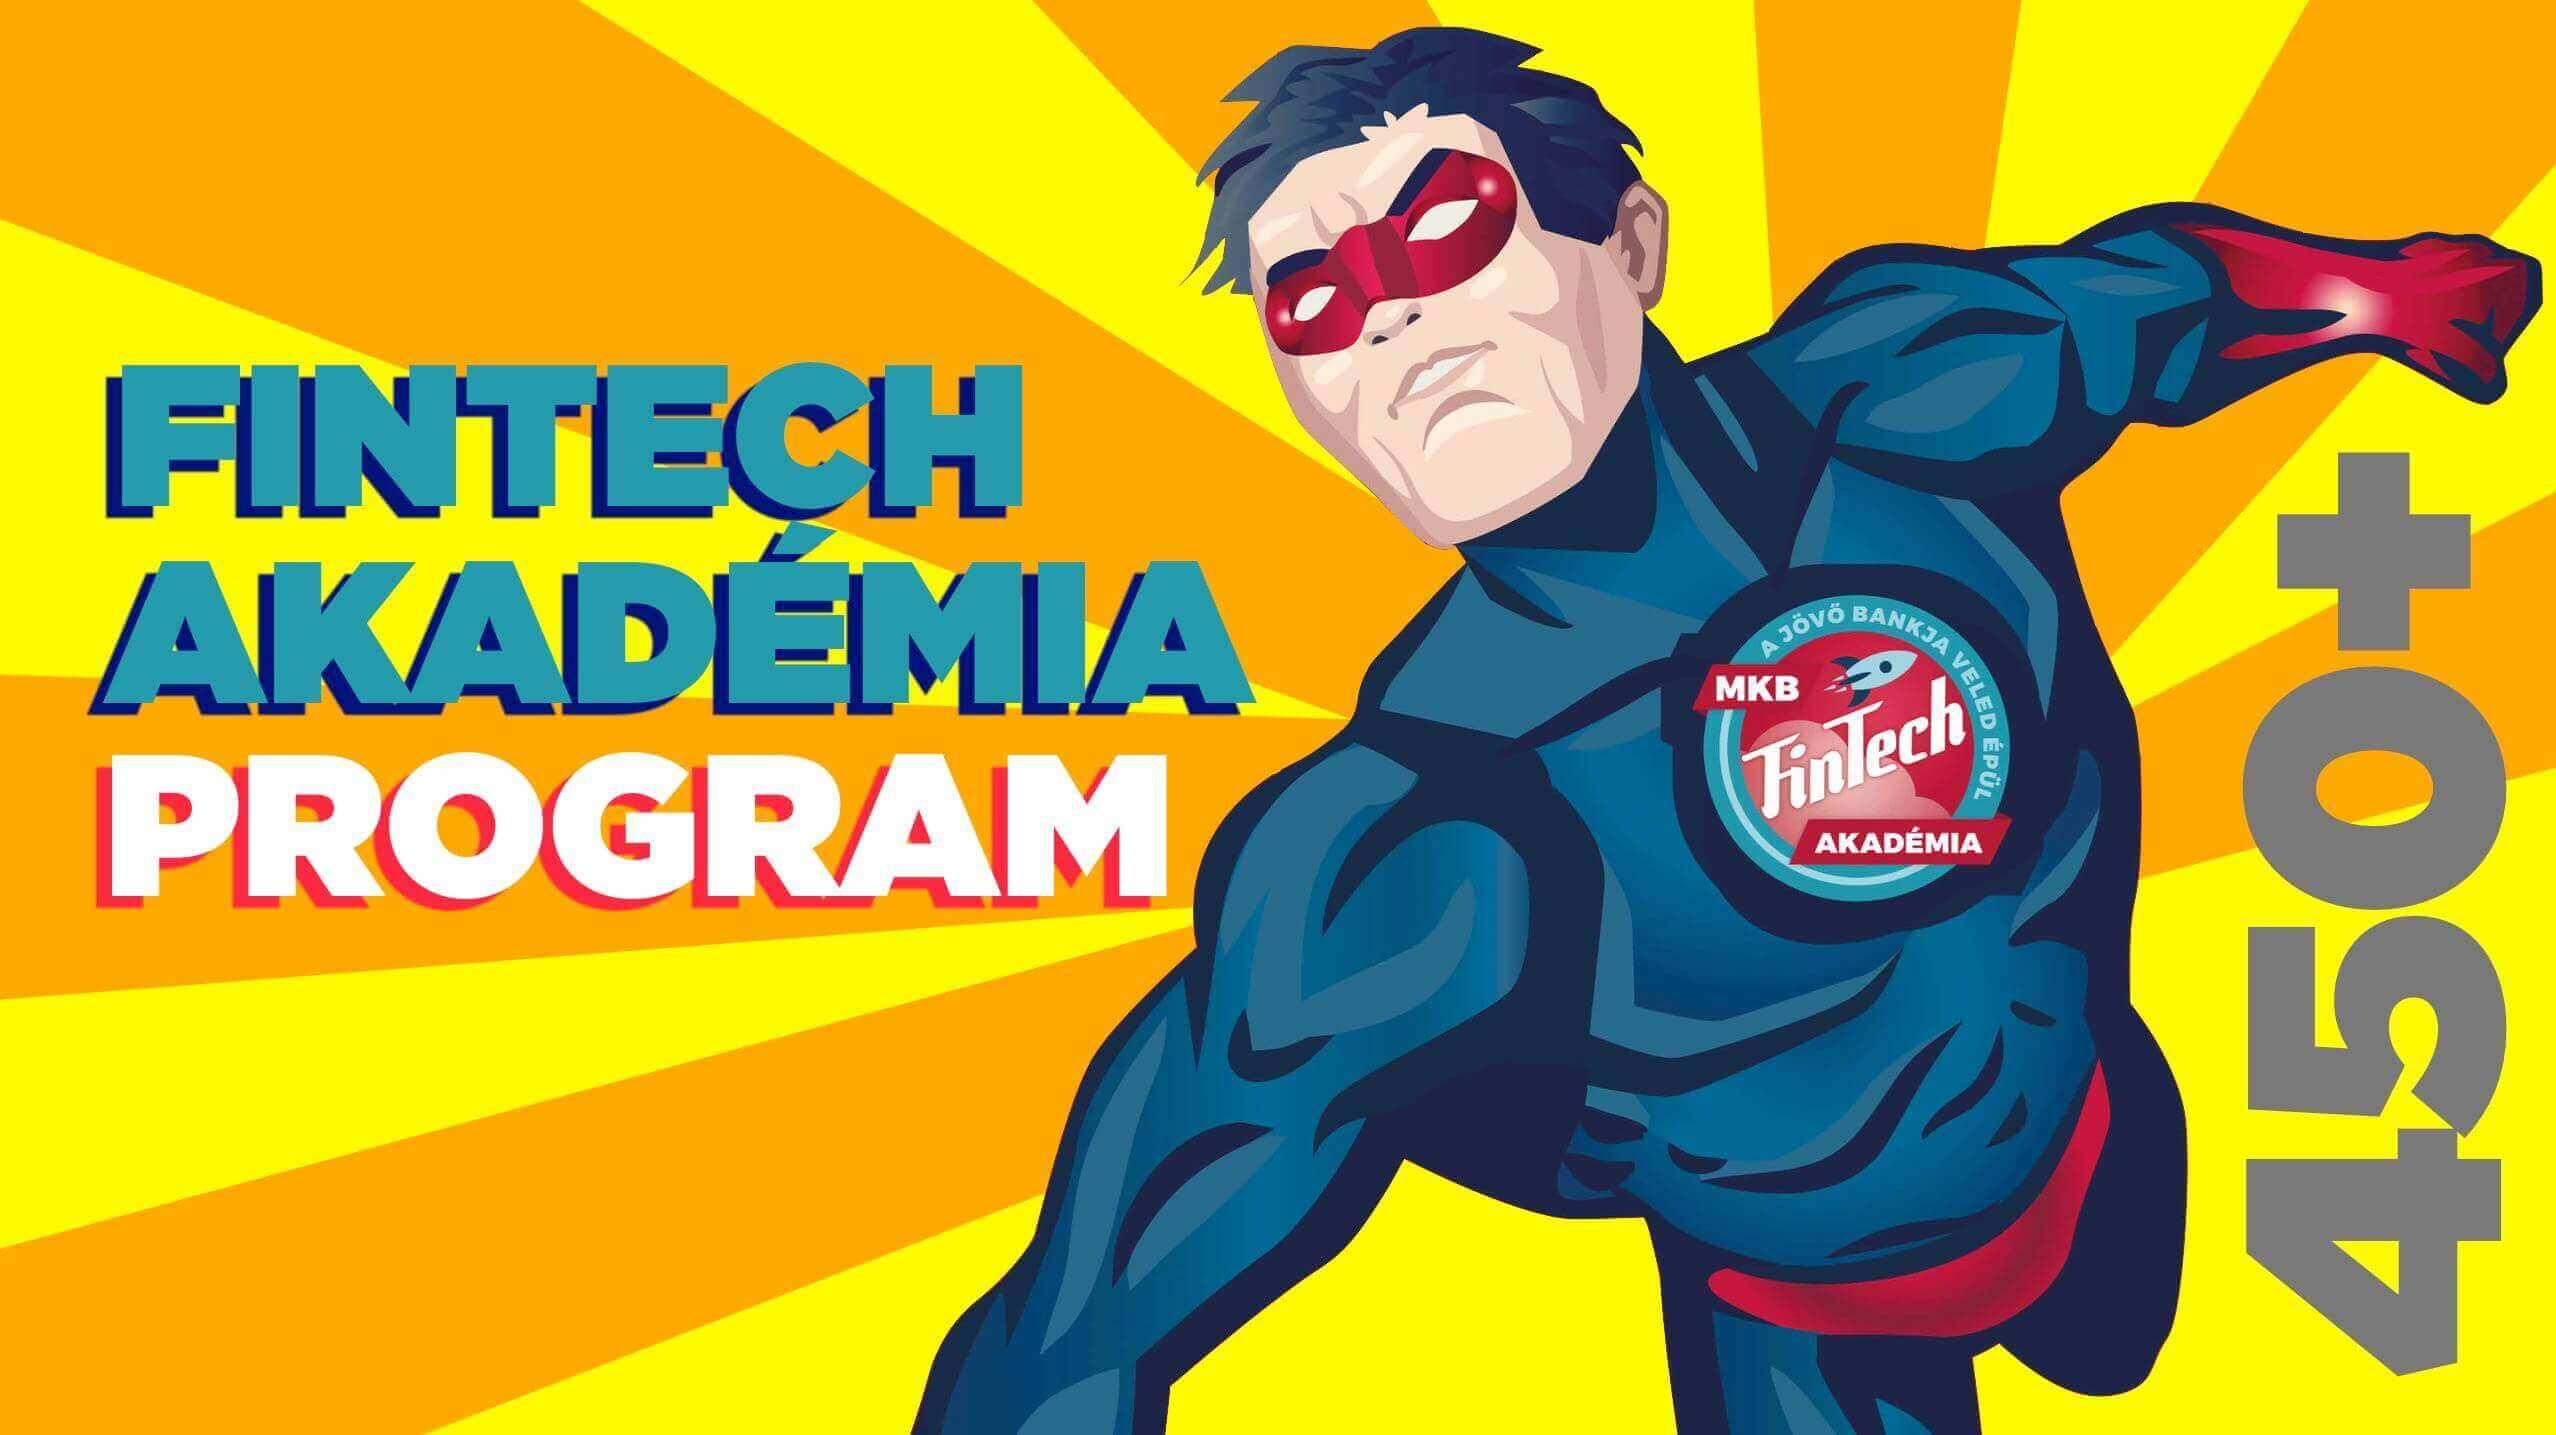 MKB FinTech Akadémia Program